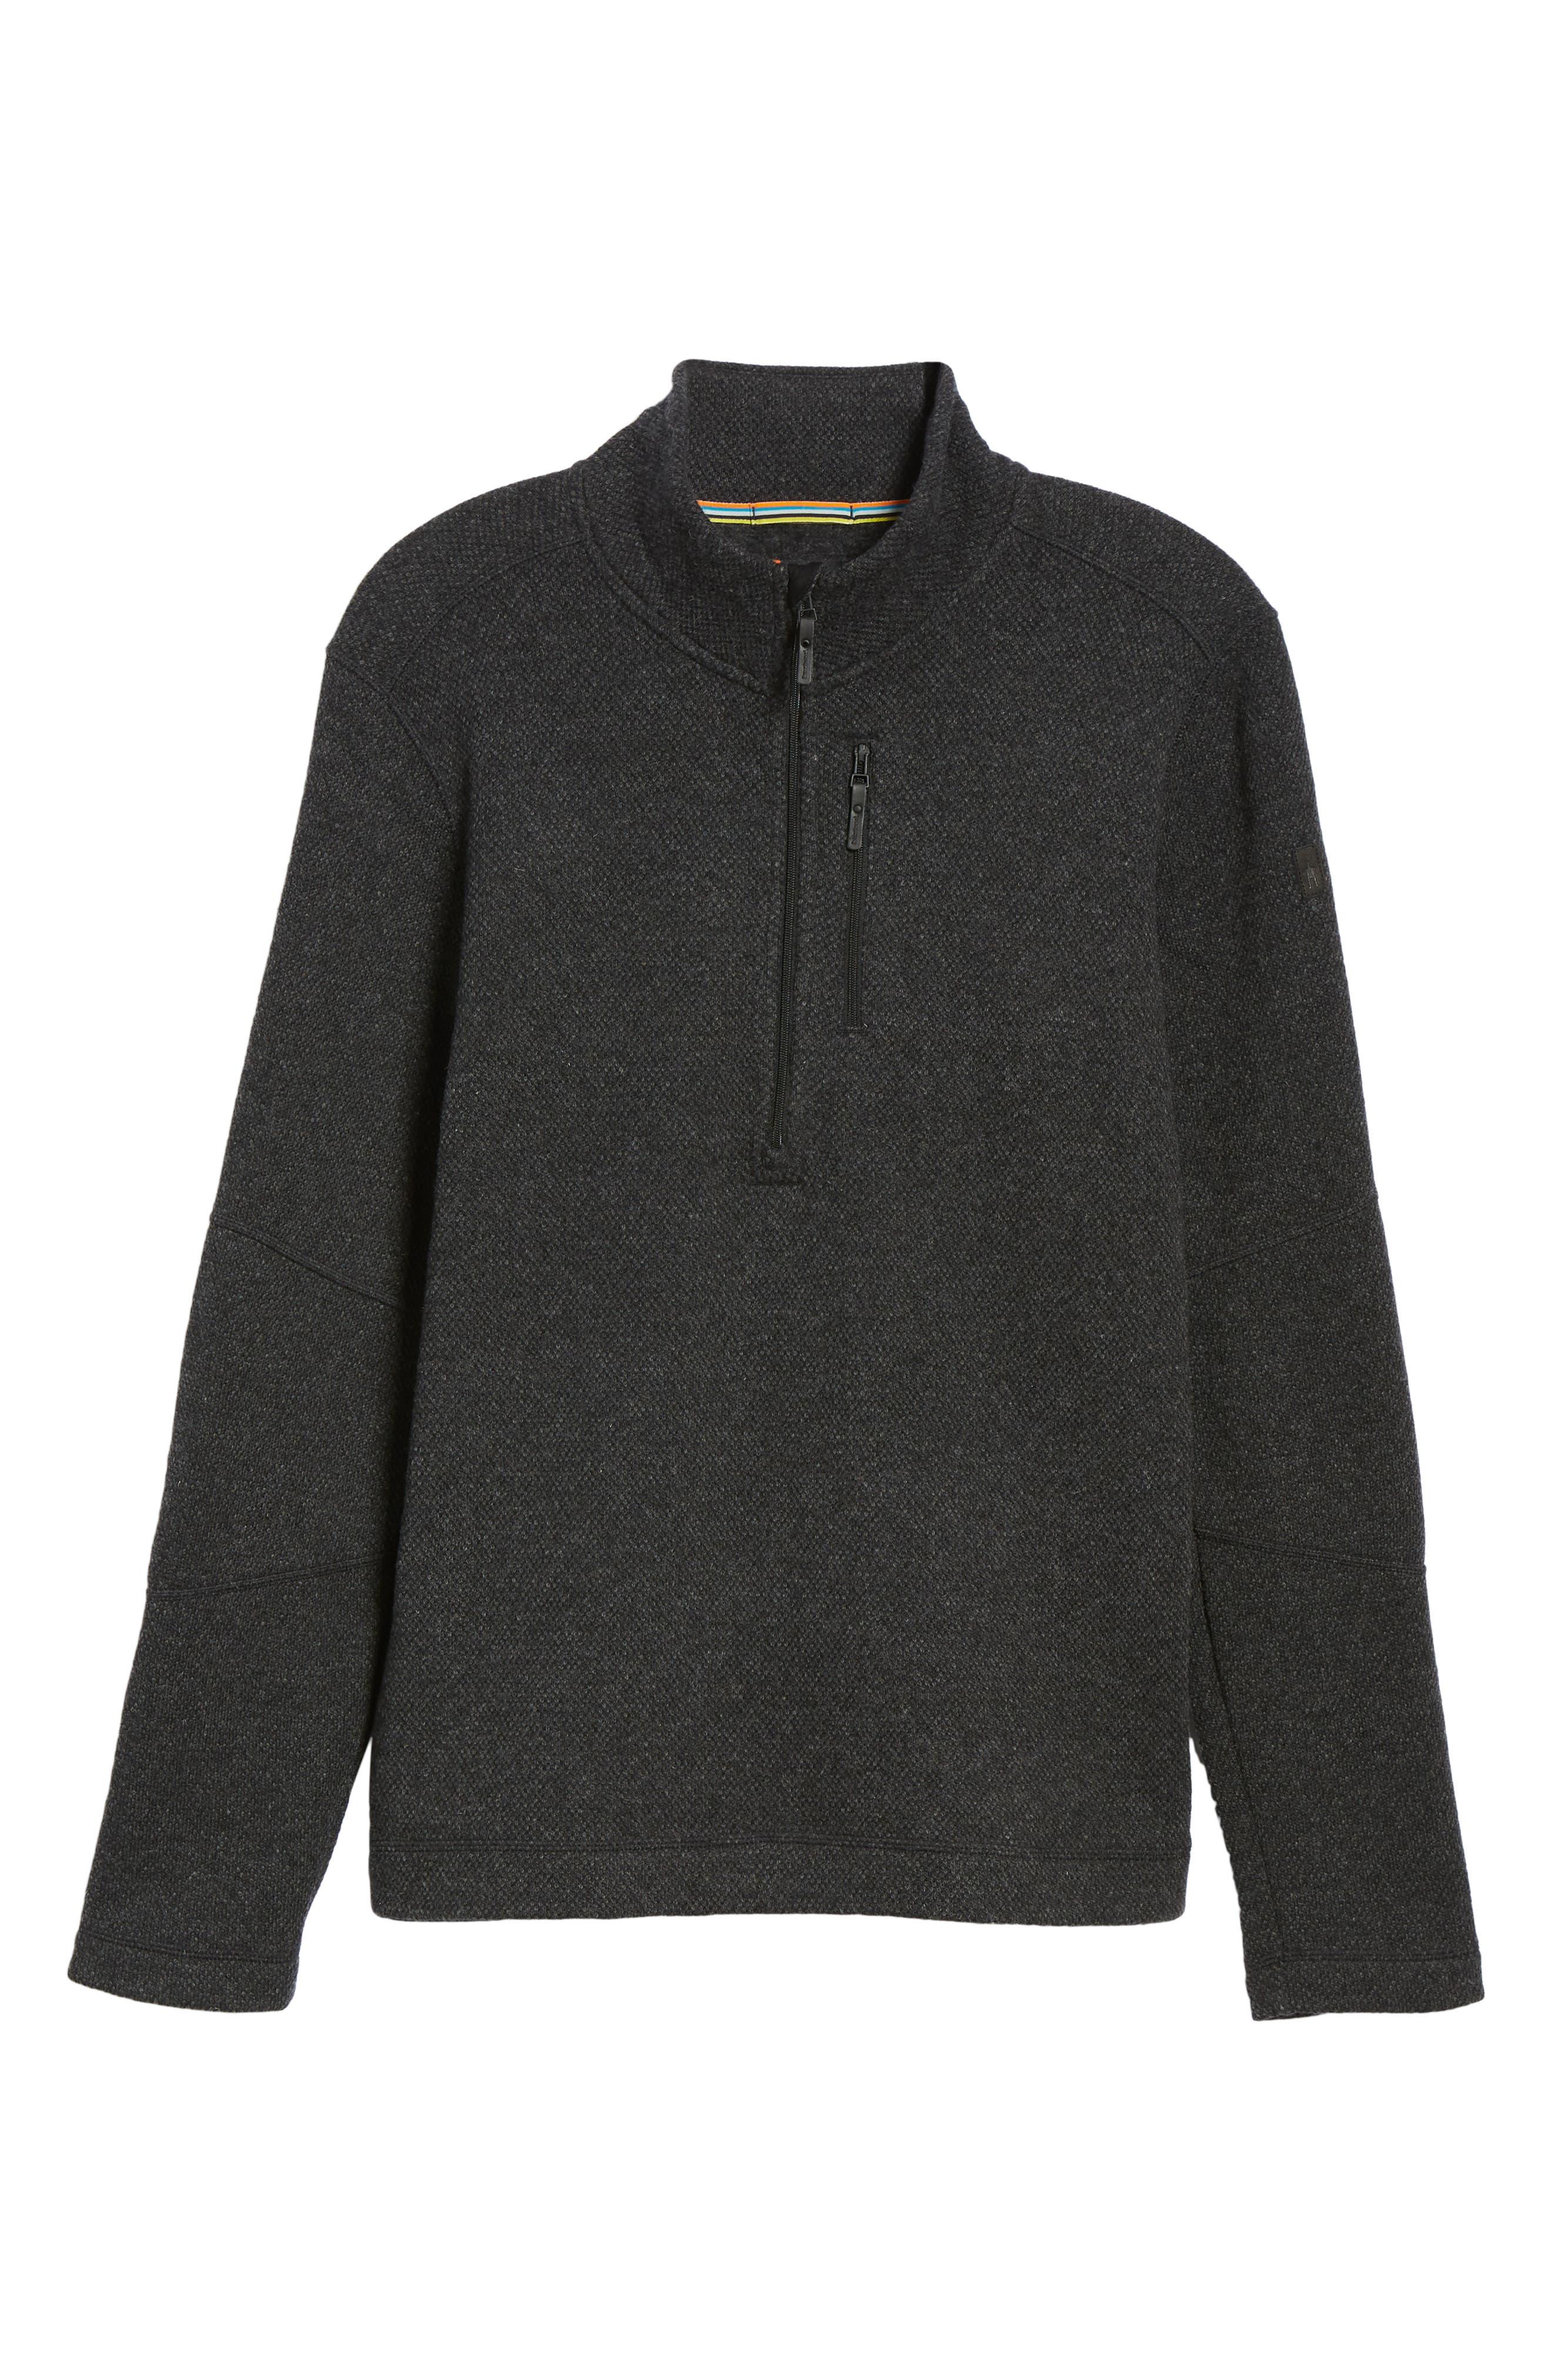 Hudson Trail Regular Fit Fleece Half-Zip Sweater,                             Alternate thumbnail 6, color,                             020